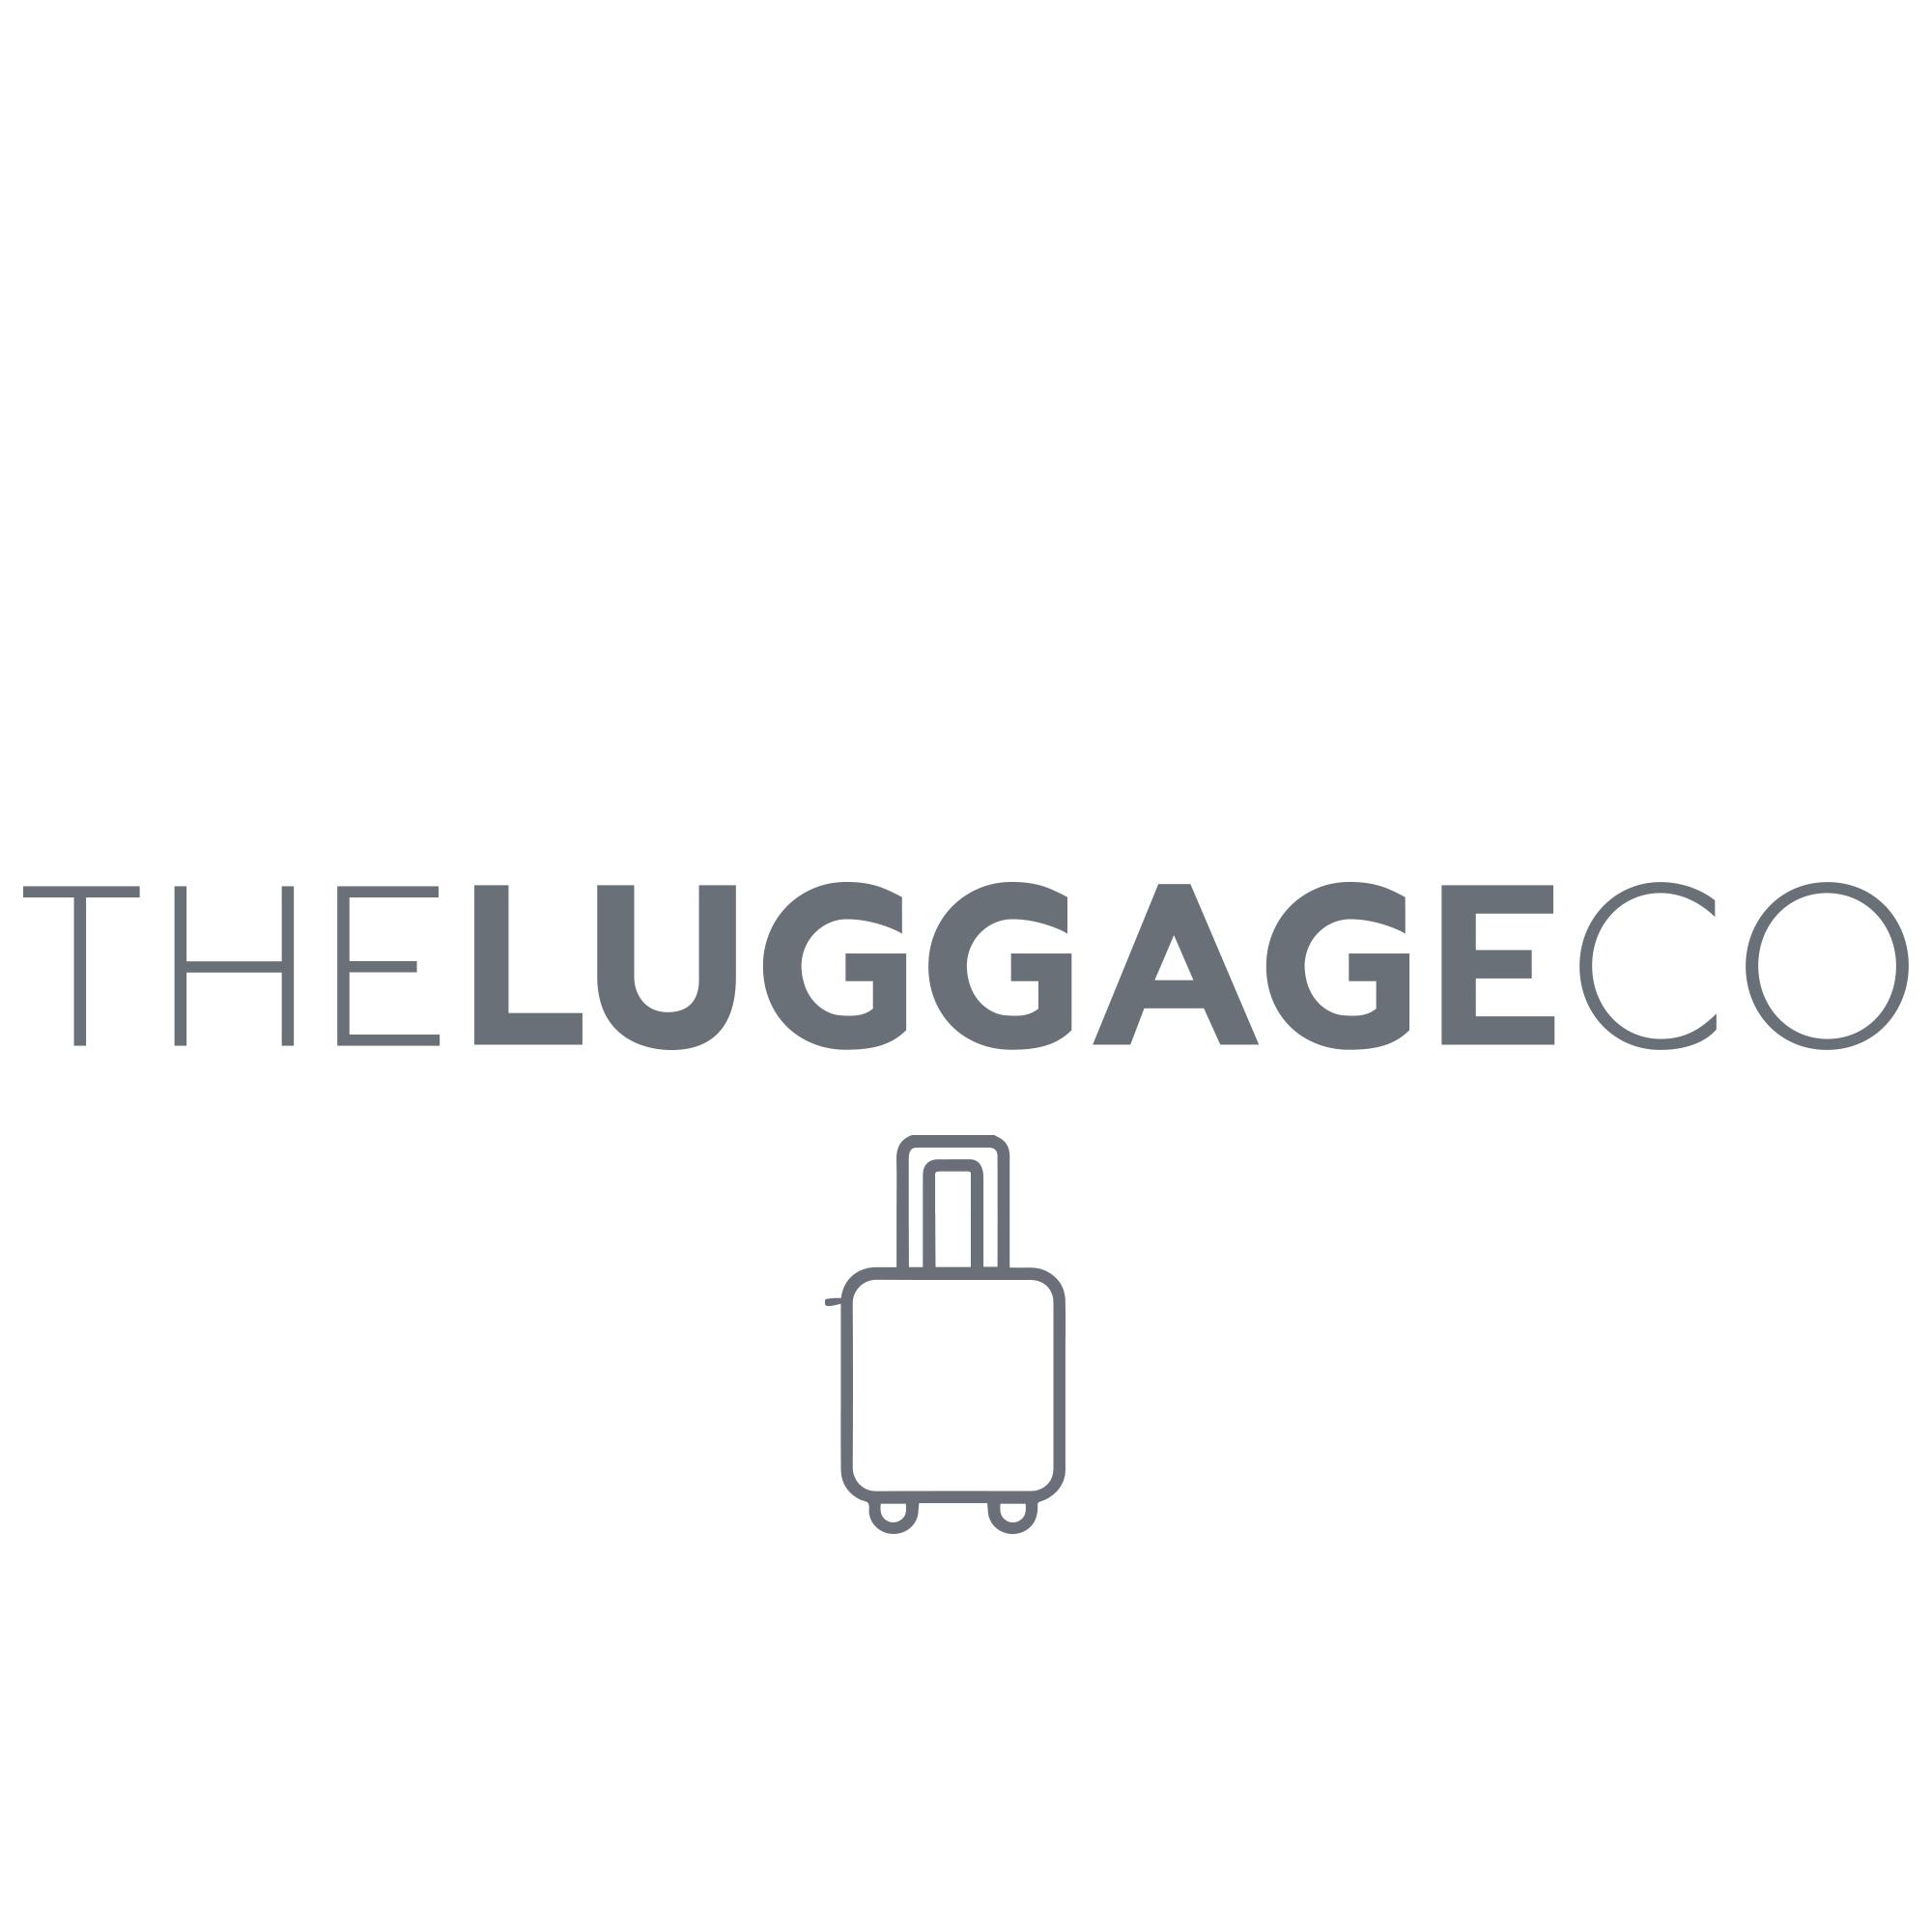 Haystack SEO The Luggage Company